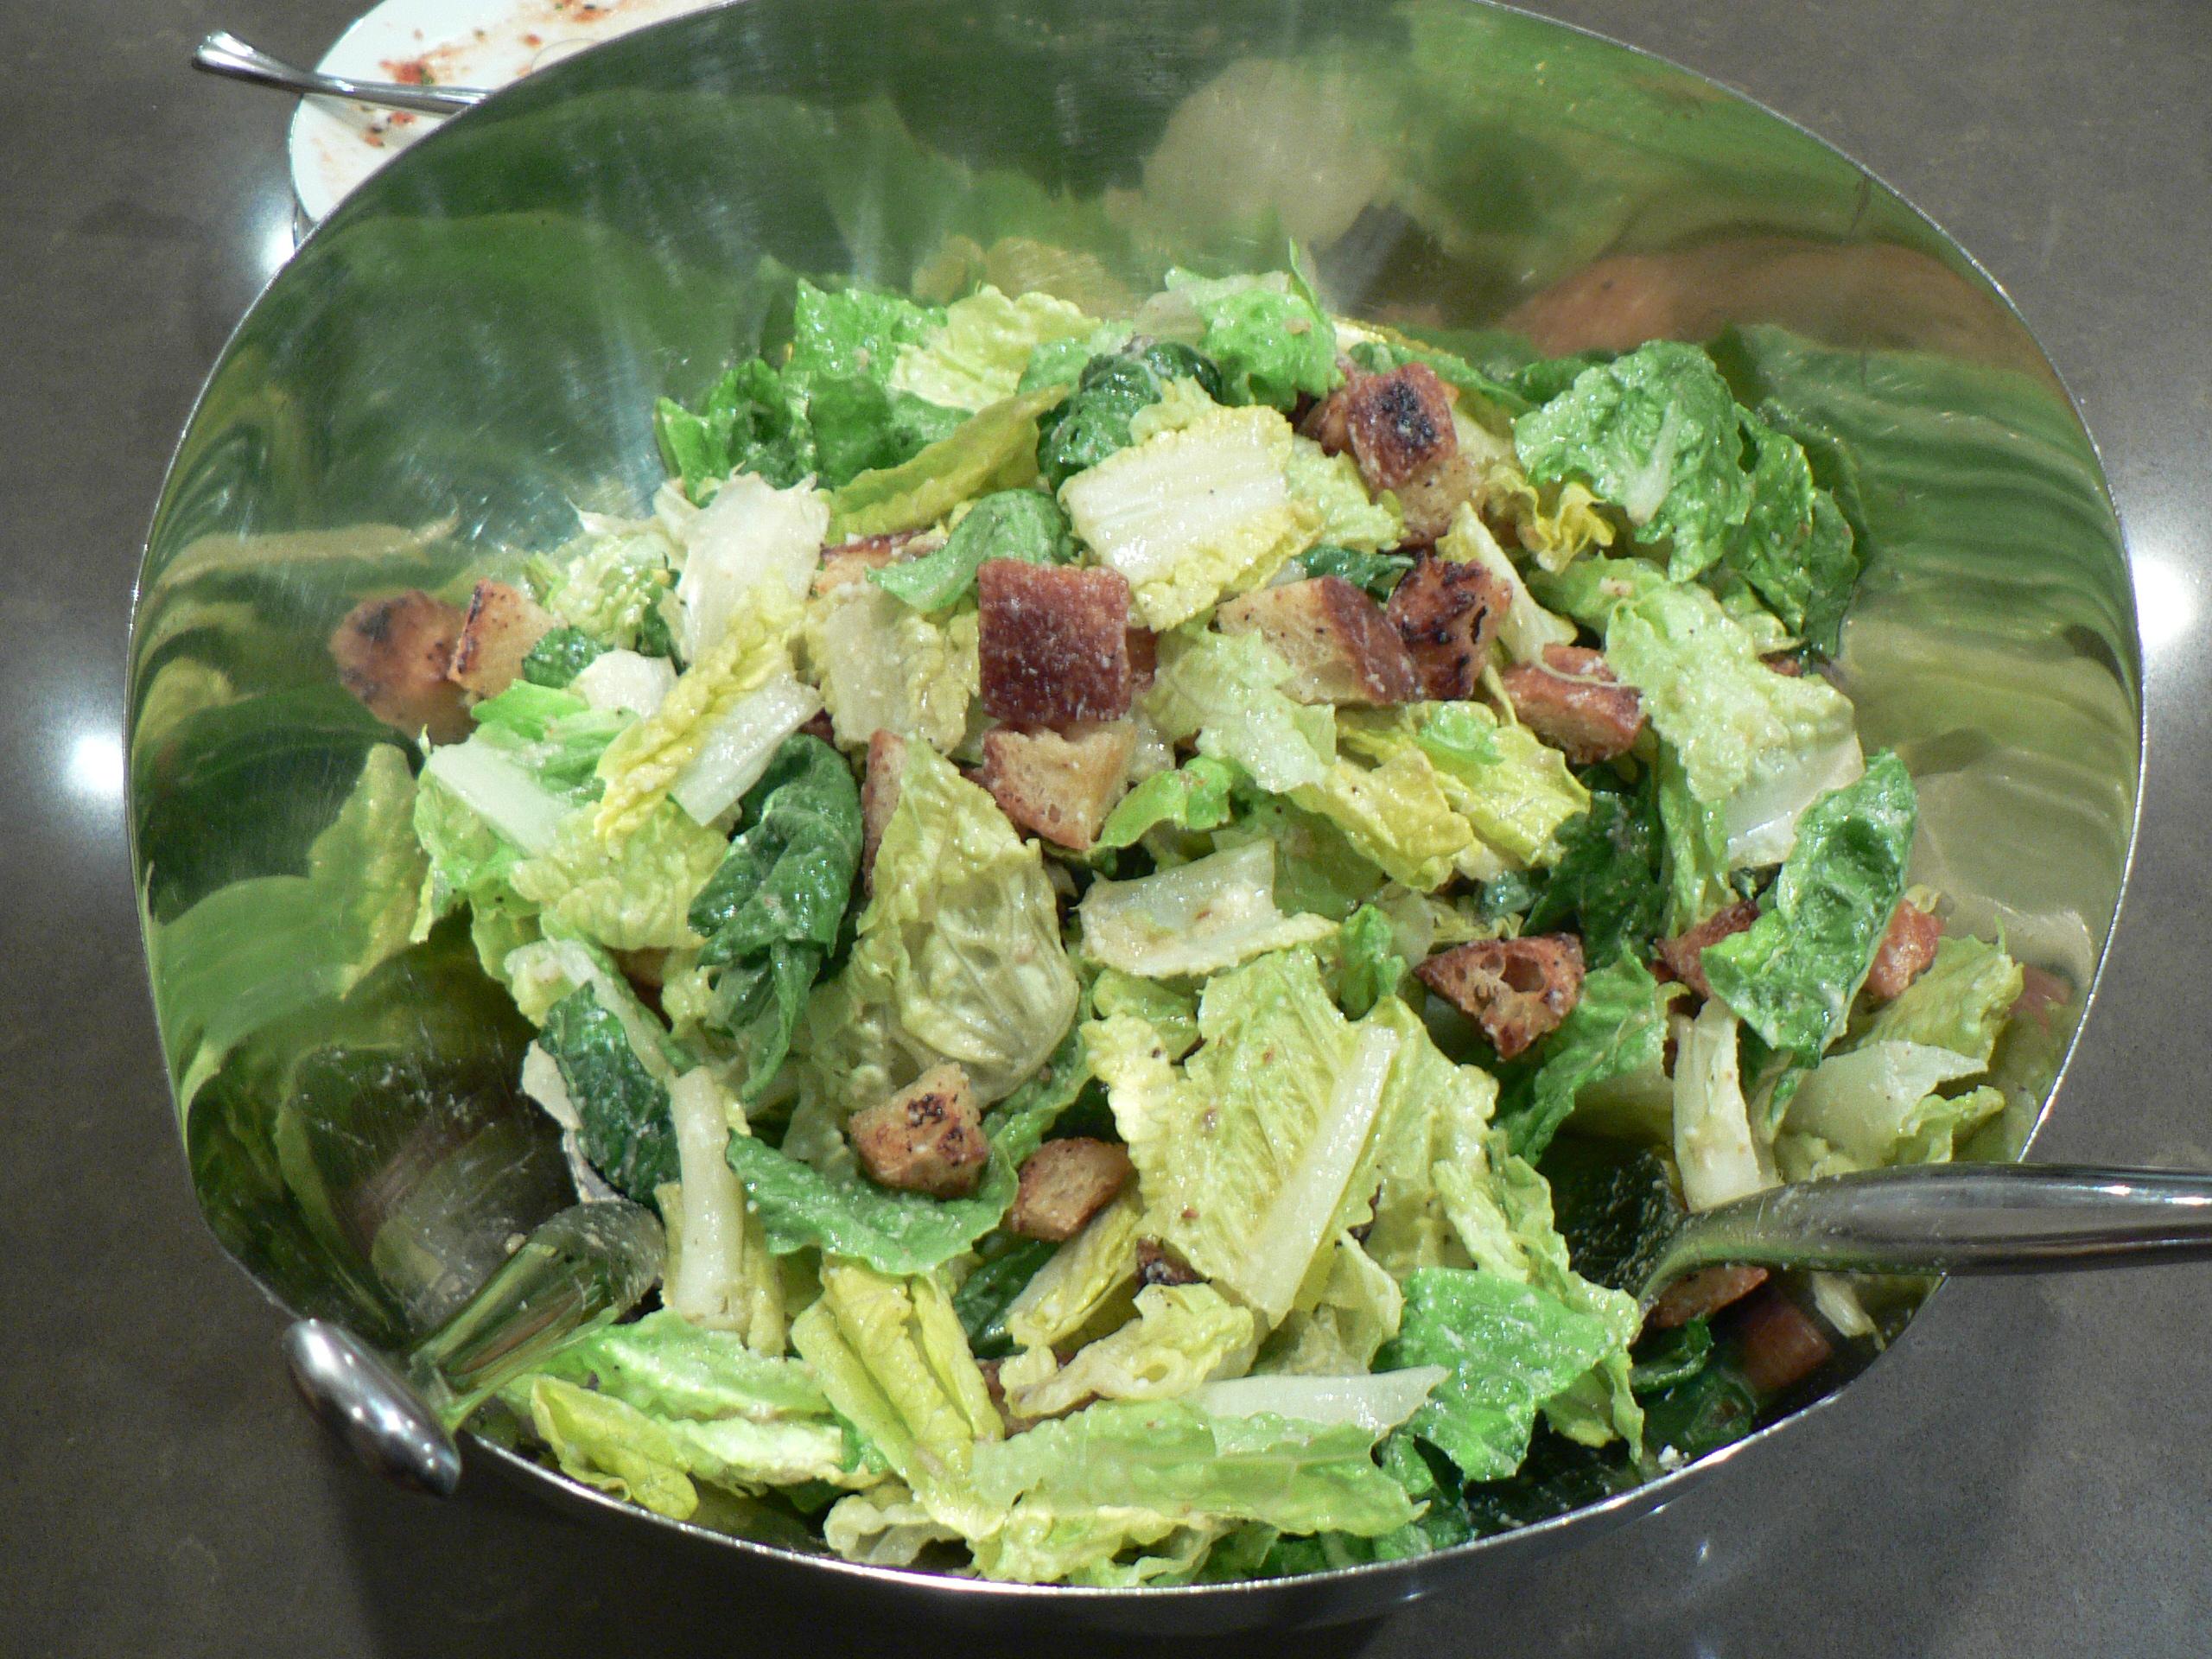 File:Caesar salad (1).jpg - Wikipedia, the free encyclopedia